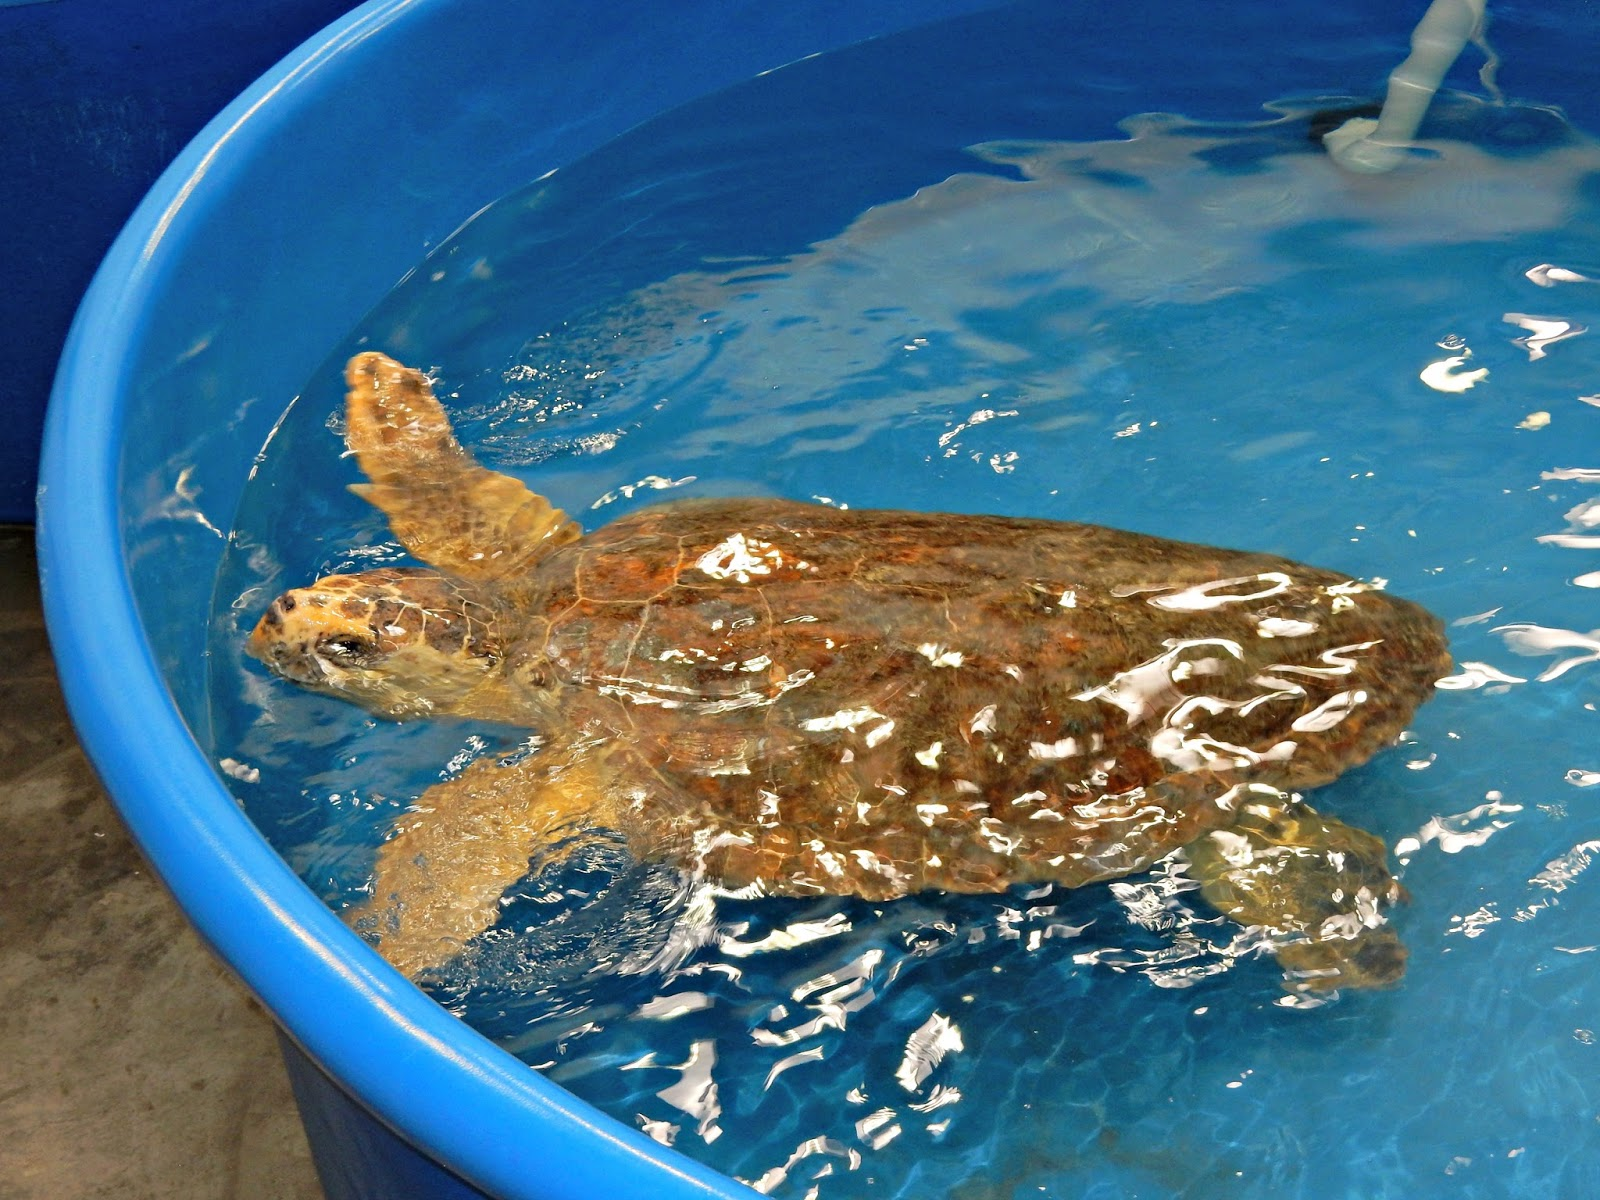 Two Bears Farm and the Three Cubs: Karen Beasley Sea Turtle Hospital